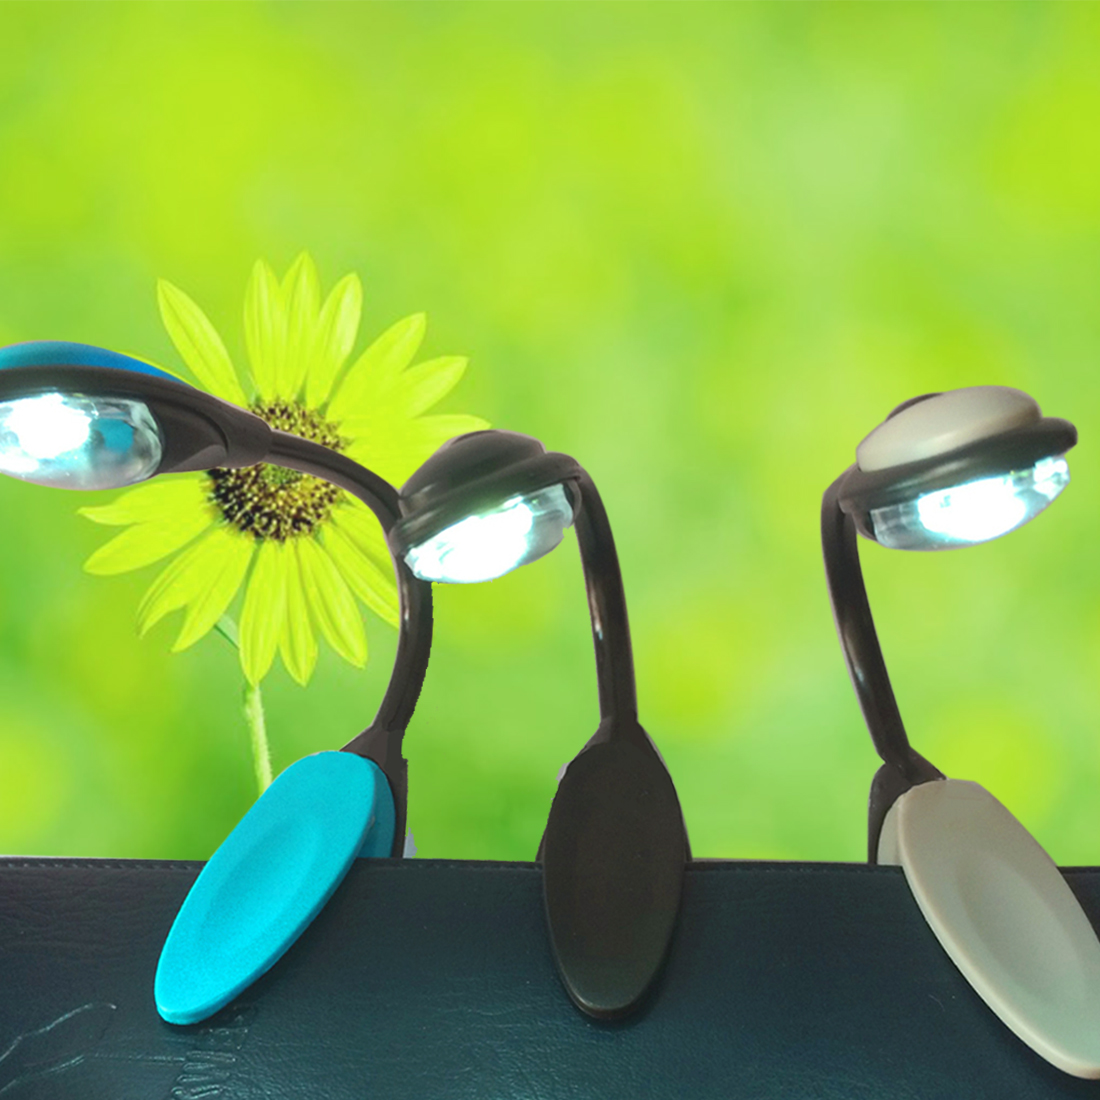 Mini Led Book Light Clip-On Flexible Bright LED Lamp Light Book Reading Lamp For Travel Bedroom Book Reader Christmas Gifts reader book 2 черный